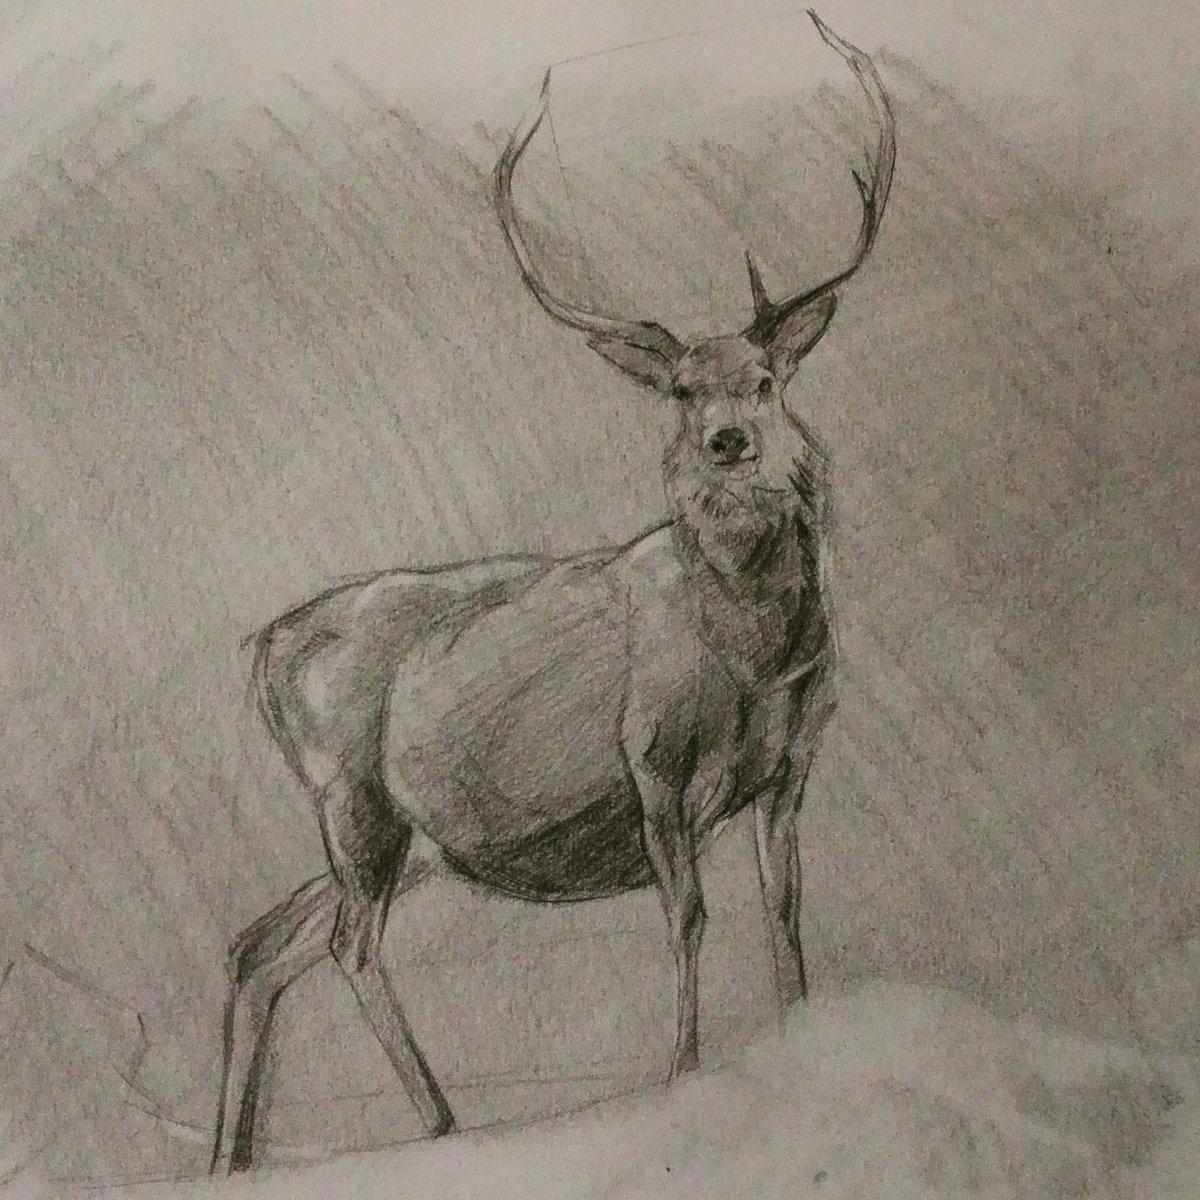 Drawn stag bambi